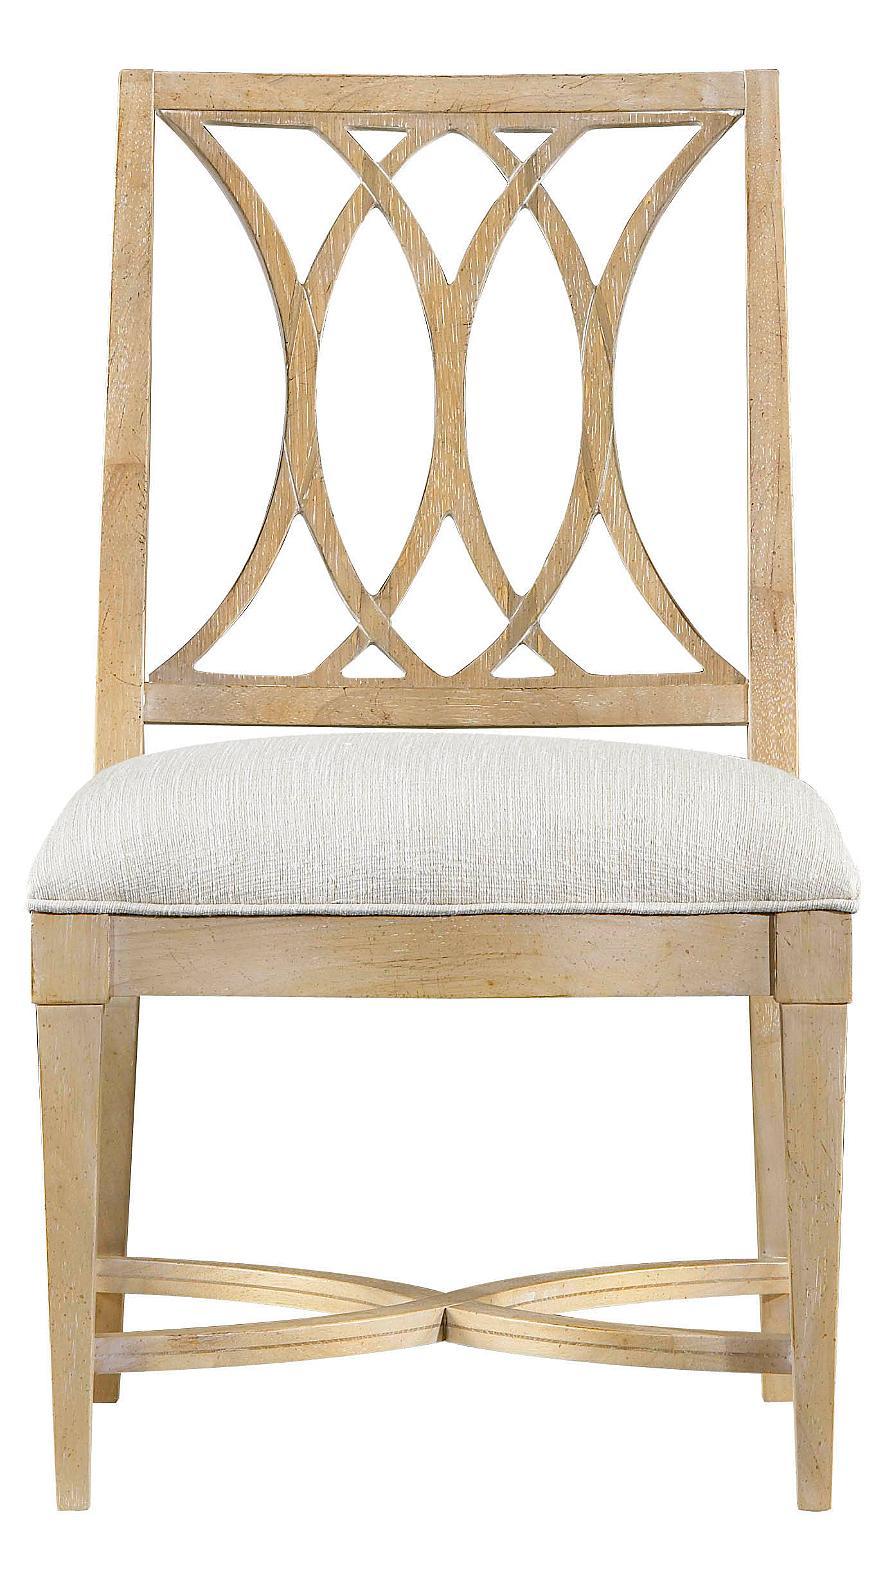 Stanley Furniture Coastal Living Resort Heritage Coast Side Chair - Item Number: 062-61-60